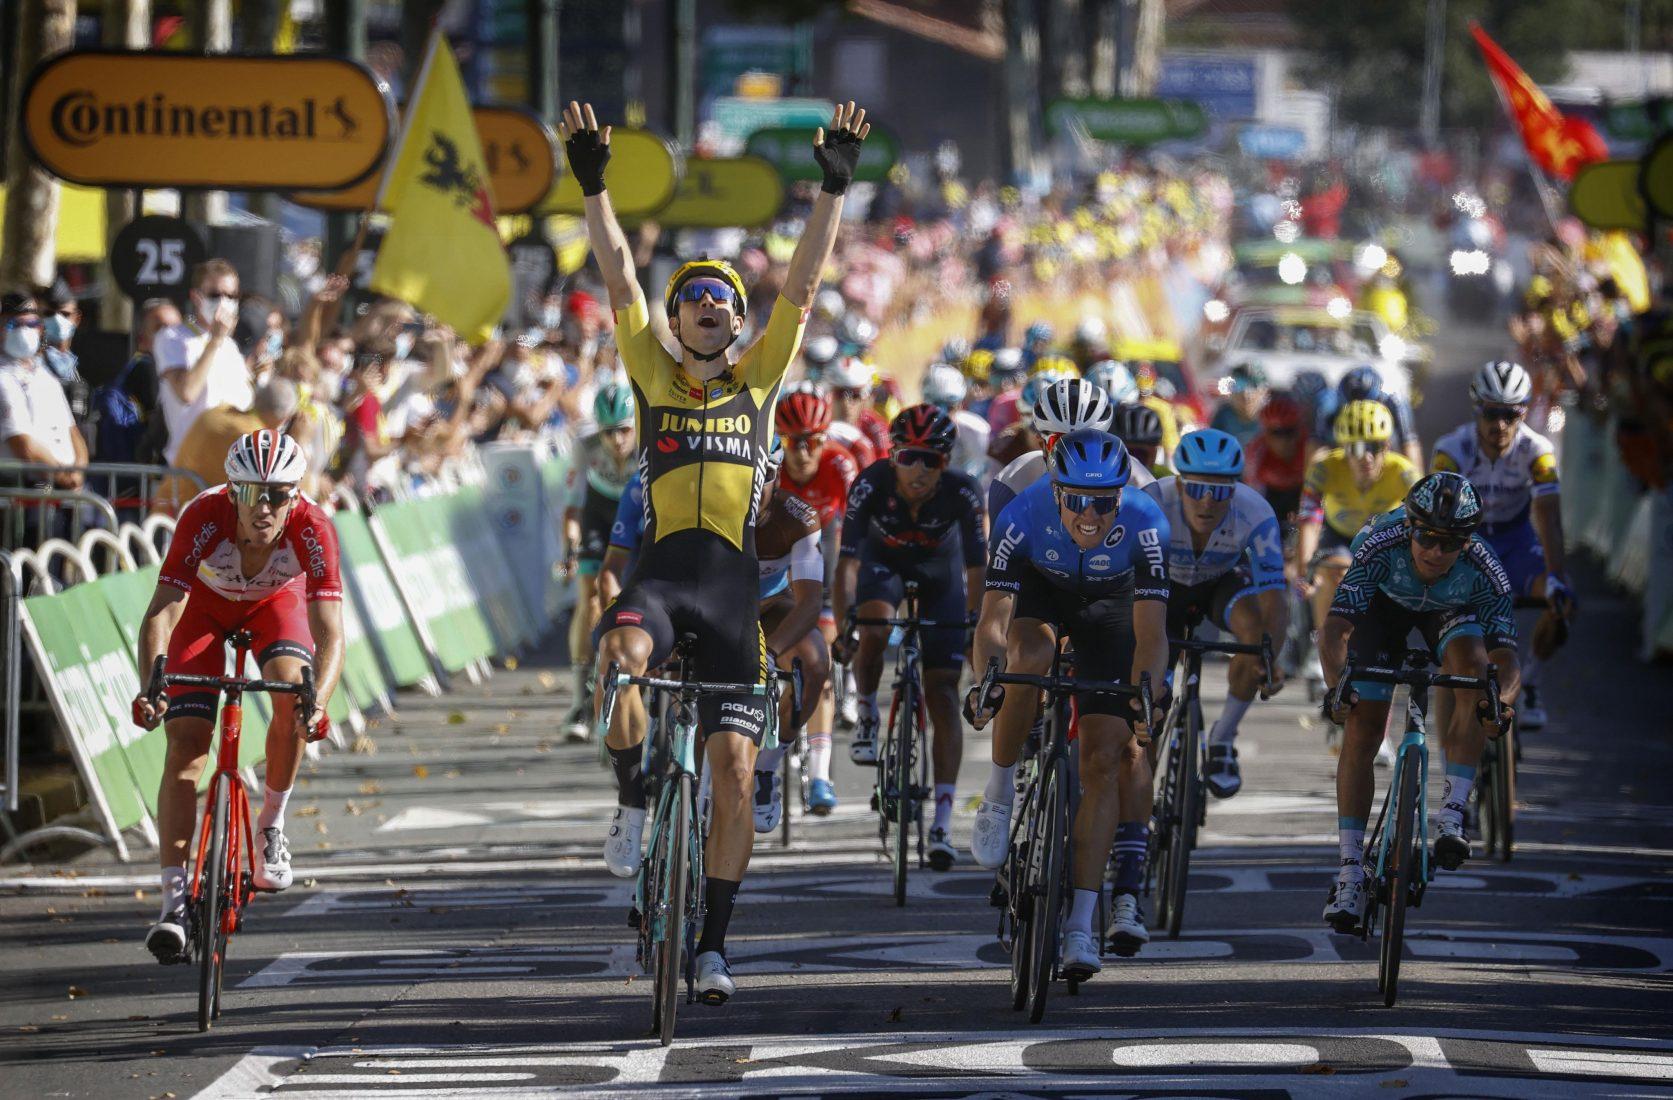 Tour 2020: Van Aert vince ancora. Pogačar perde la maglia bianca